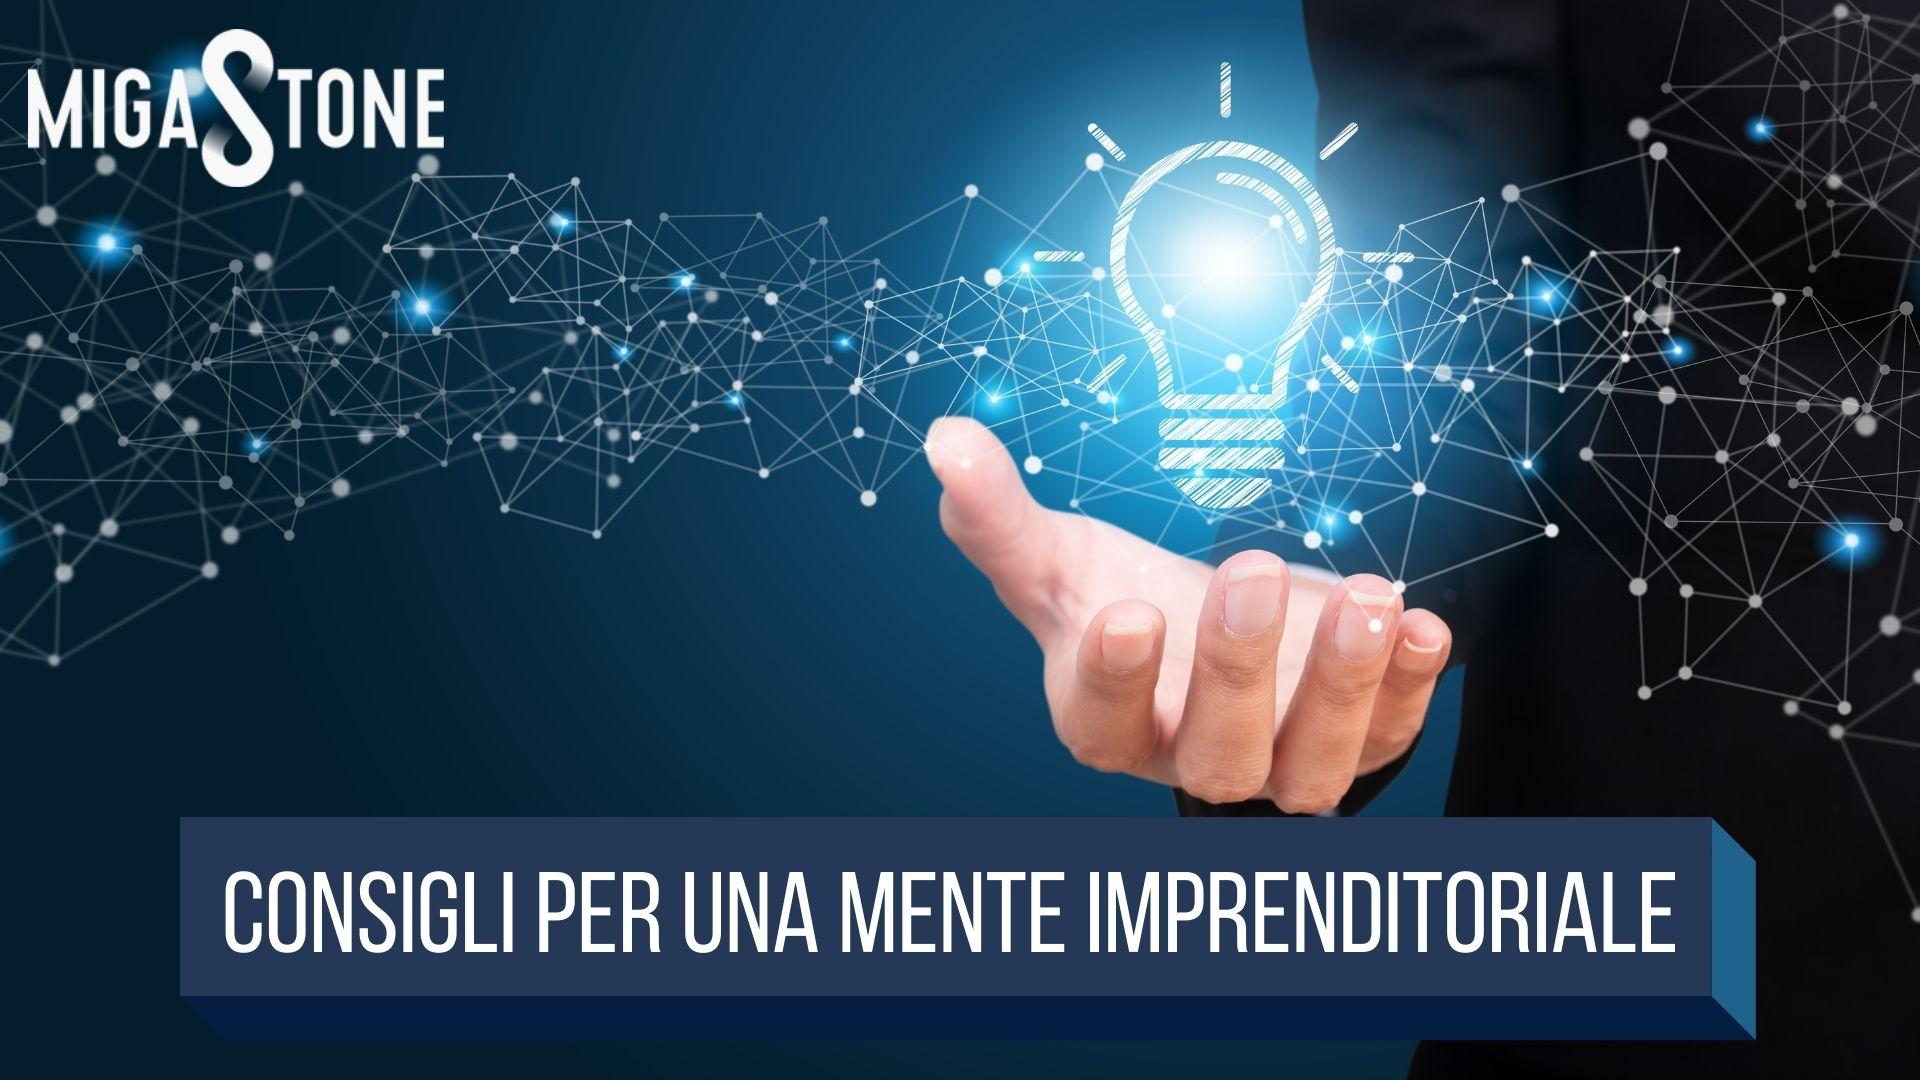 , Consigli per una mente imprenditoriale, Migastone Blog